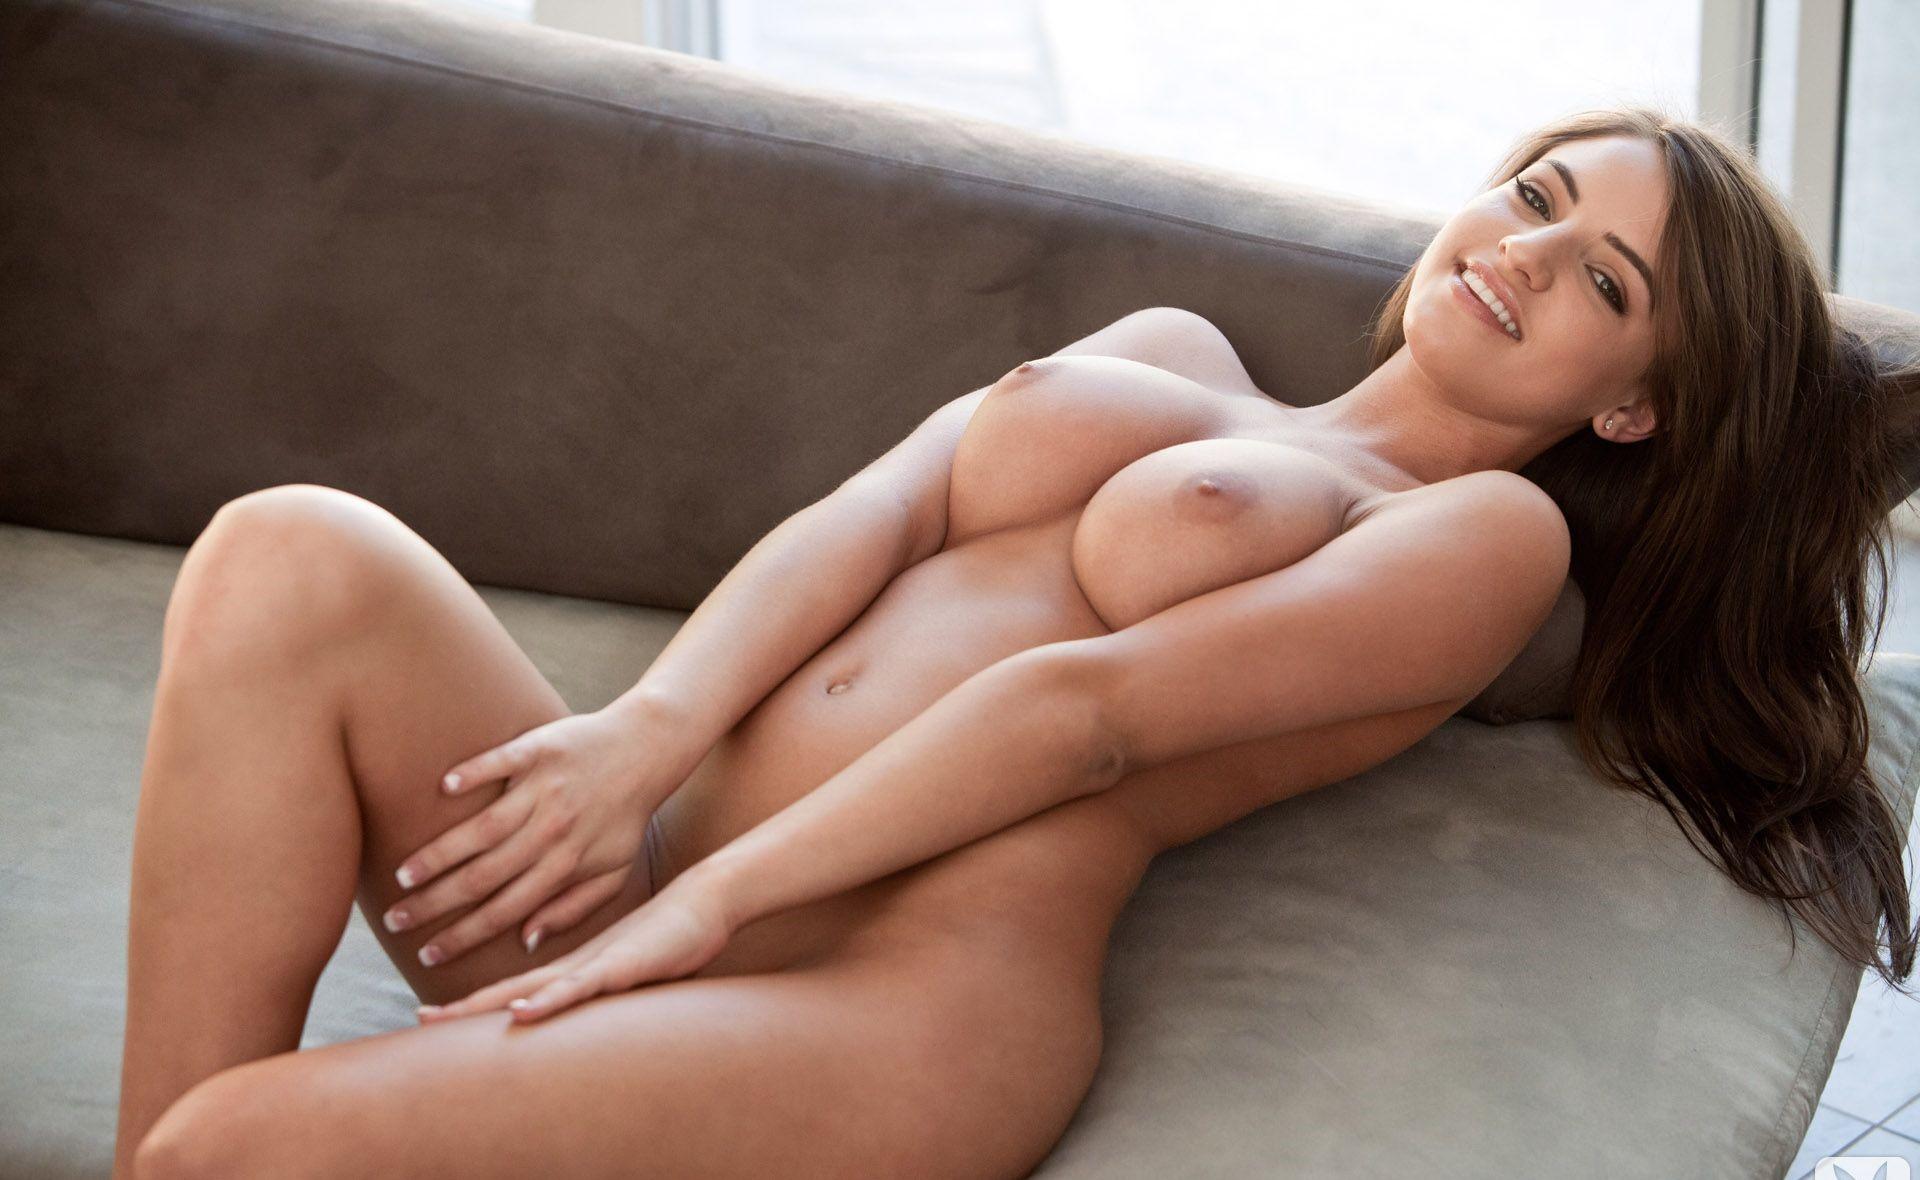 Геи секс мужчина на порно фото порева ебли онлайн